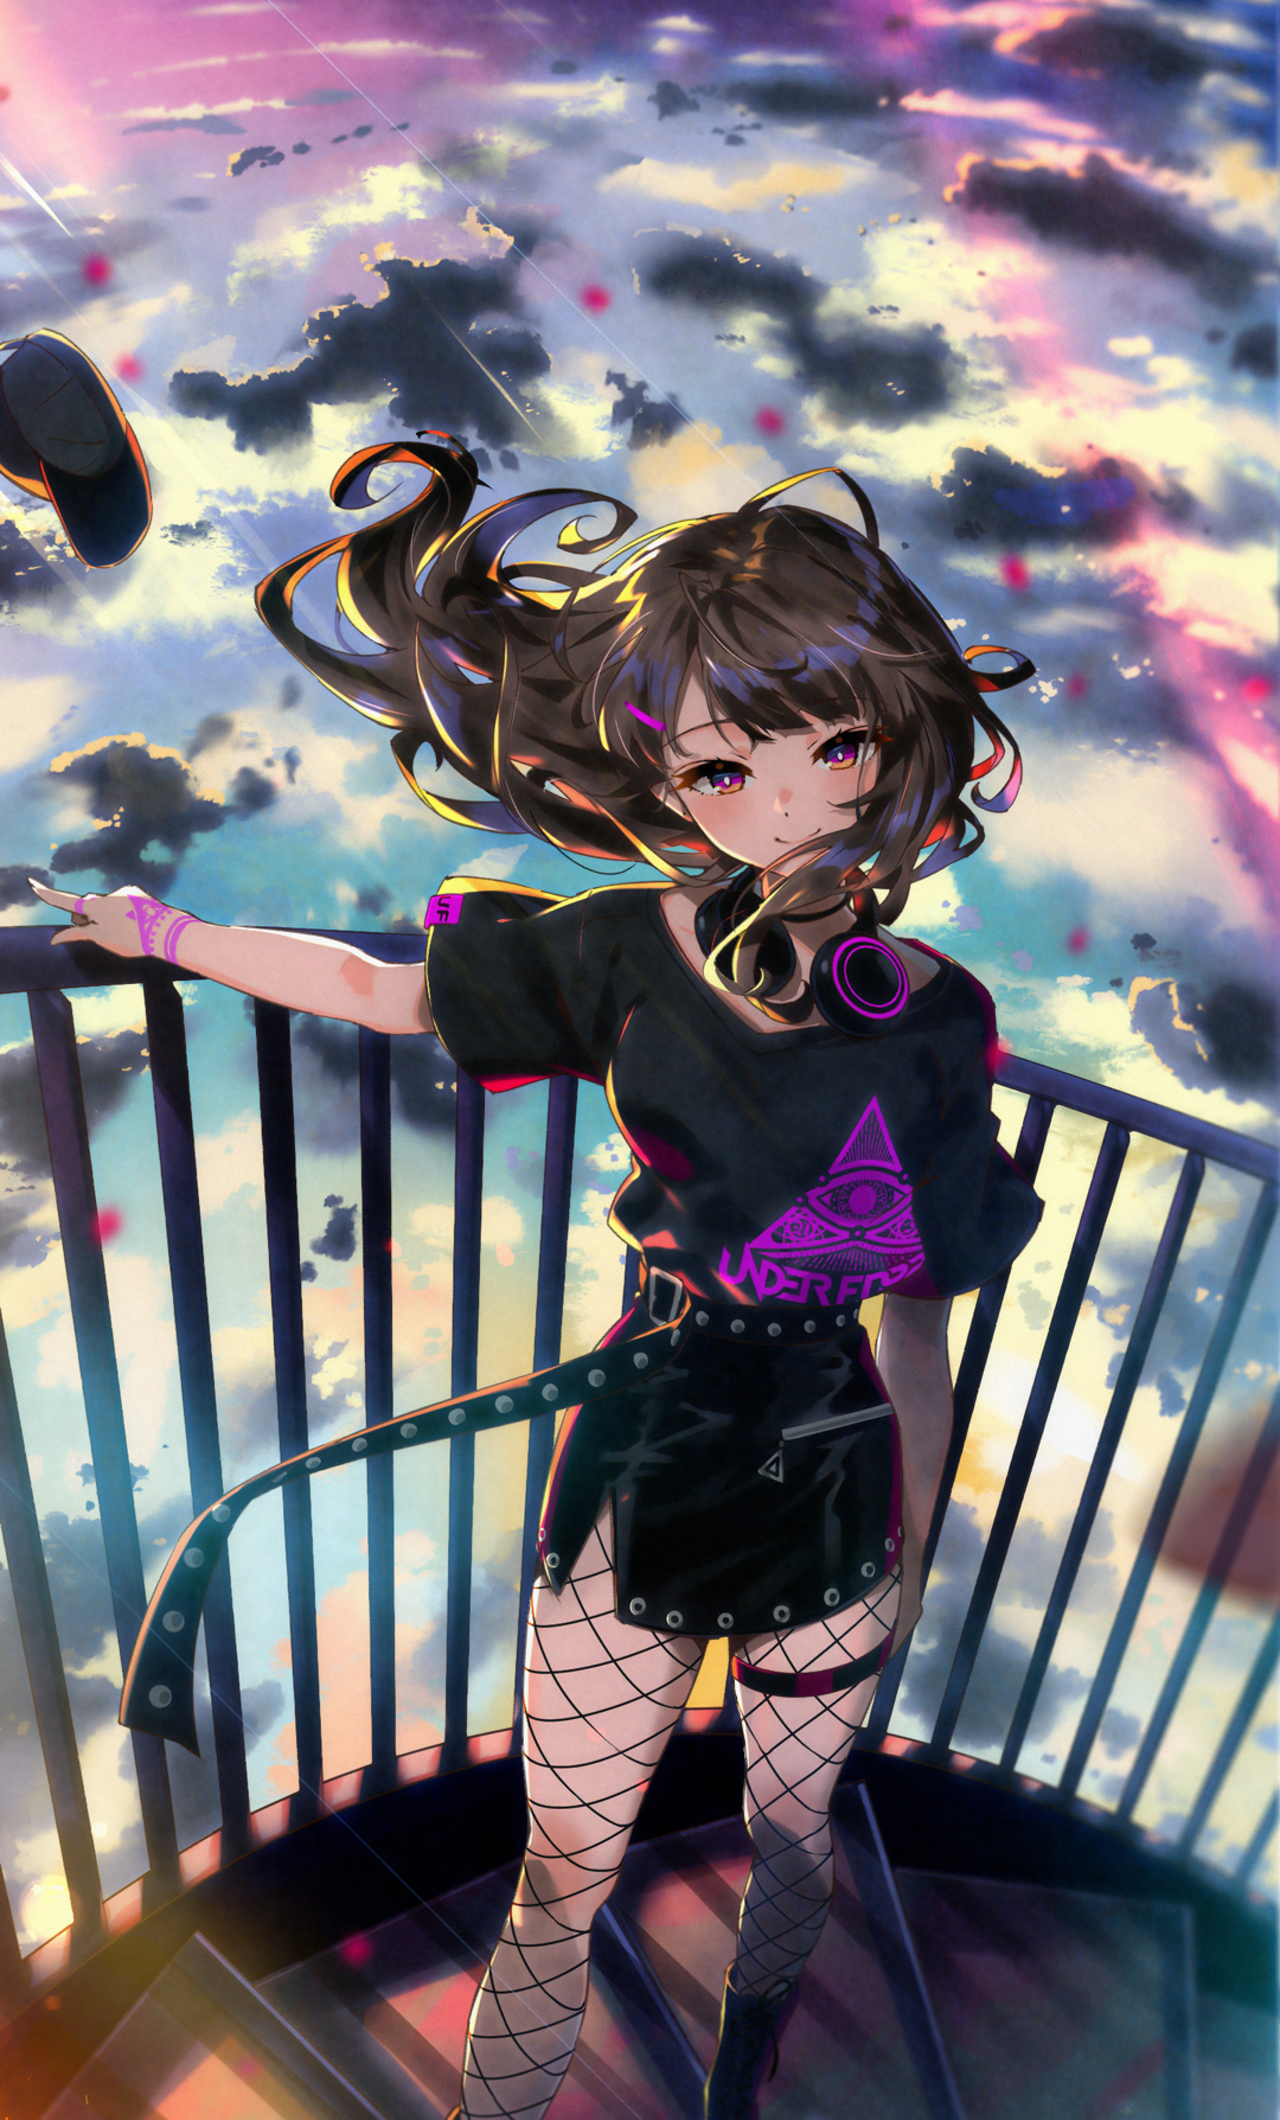 Iphone 11 Wallpaper Anime Girl Blue 4k Hd Download - Anime Girl Wallpaper 4k Iphone , HD Wallpaper & Backgrounds